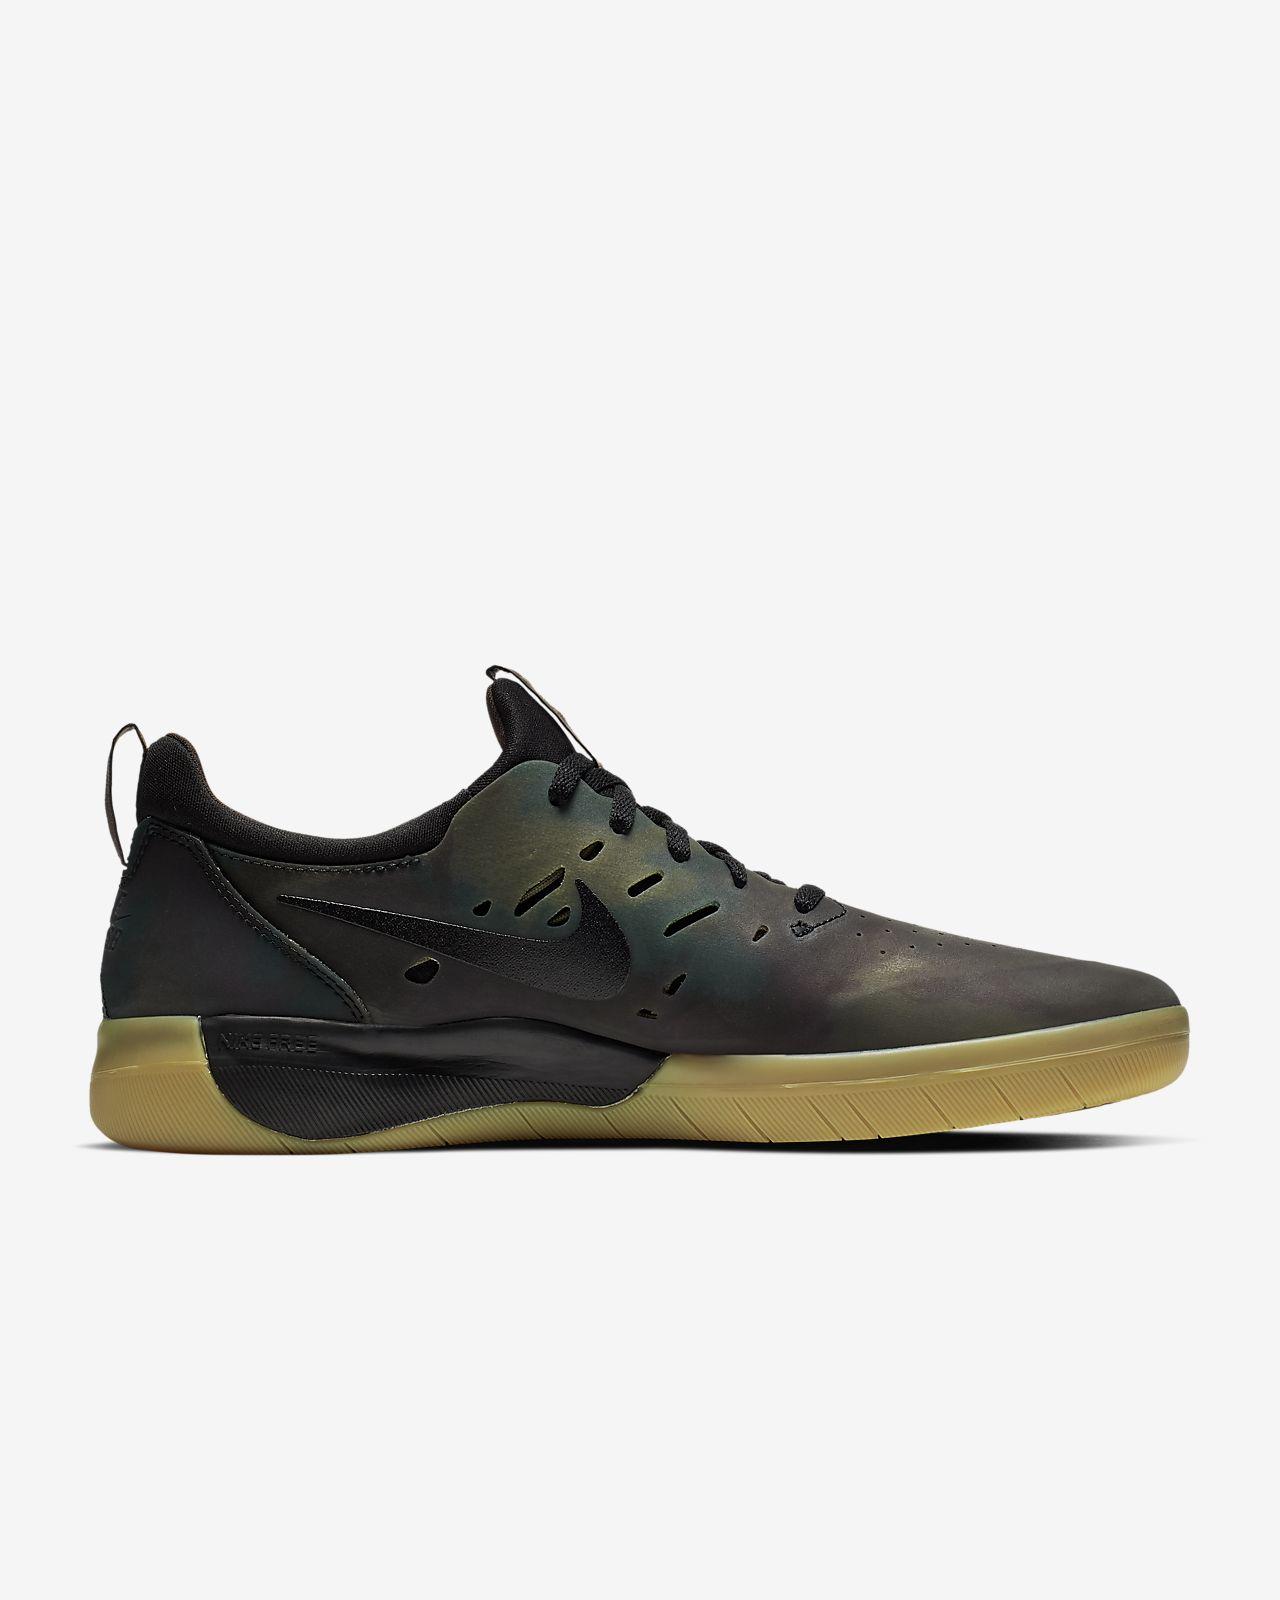 super popular 10631 6fdf1 ... Atmosphere Grey   Berry Skate Shoes   Zumiez · Nike SB Nyjah Free  Premium Skate Shoe. nike sb nyjah free skate